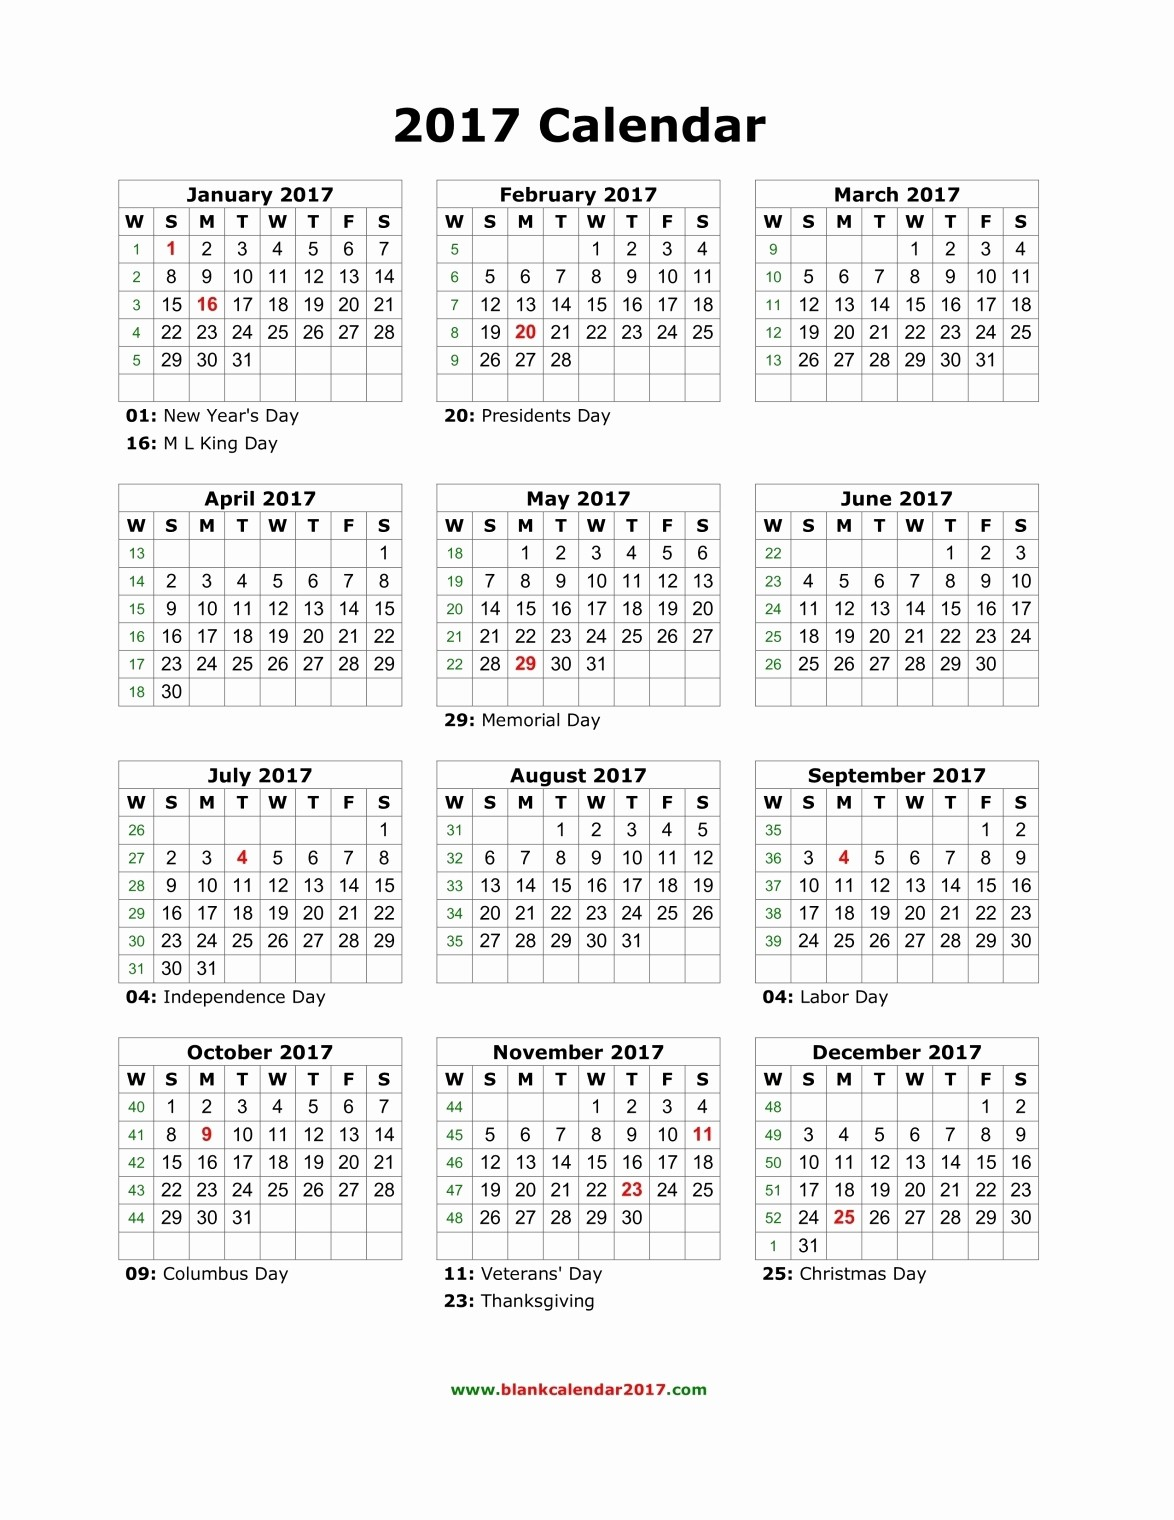 2017 Weekly Calendar with Holidays Fresh Blank Calendar 2017